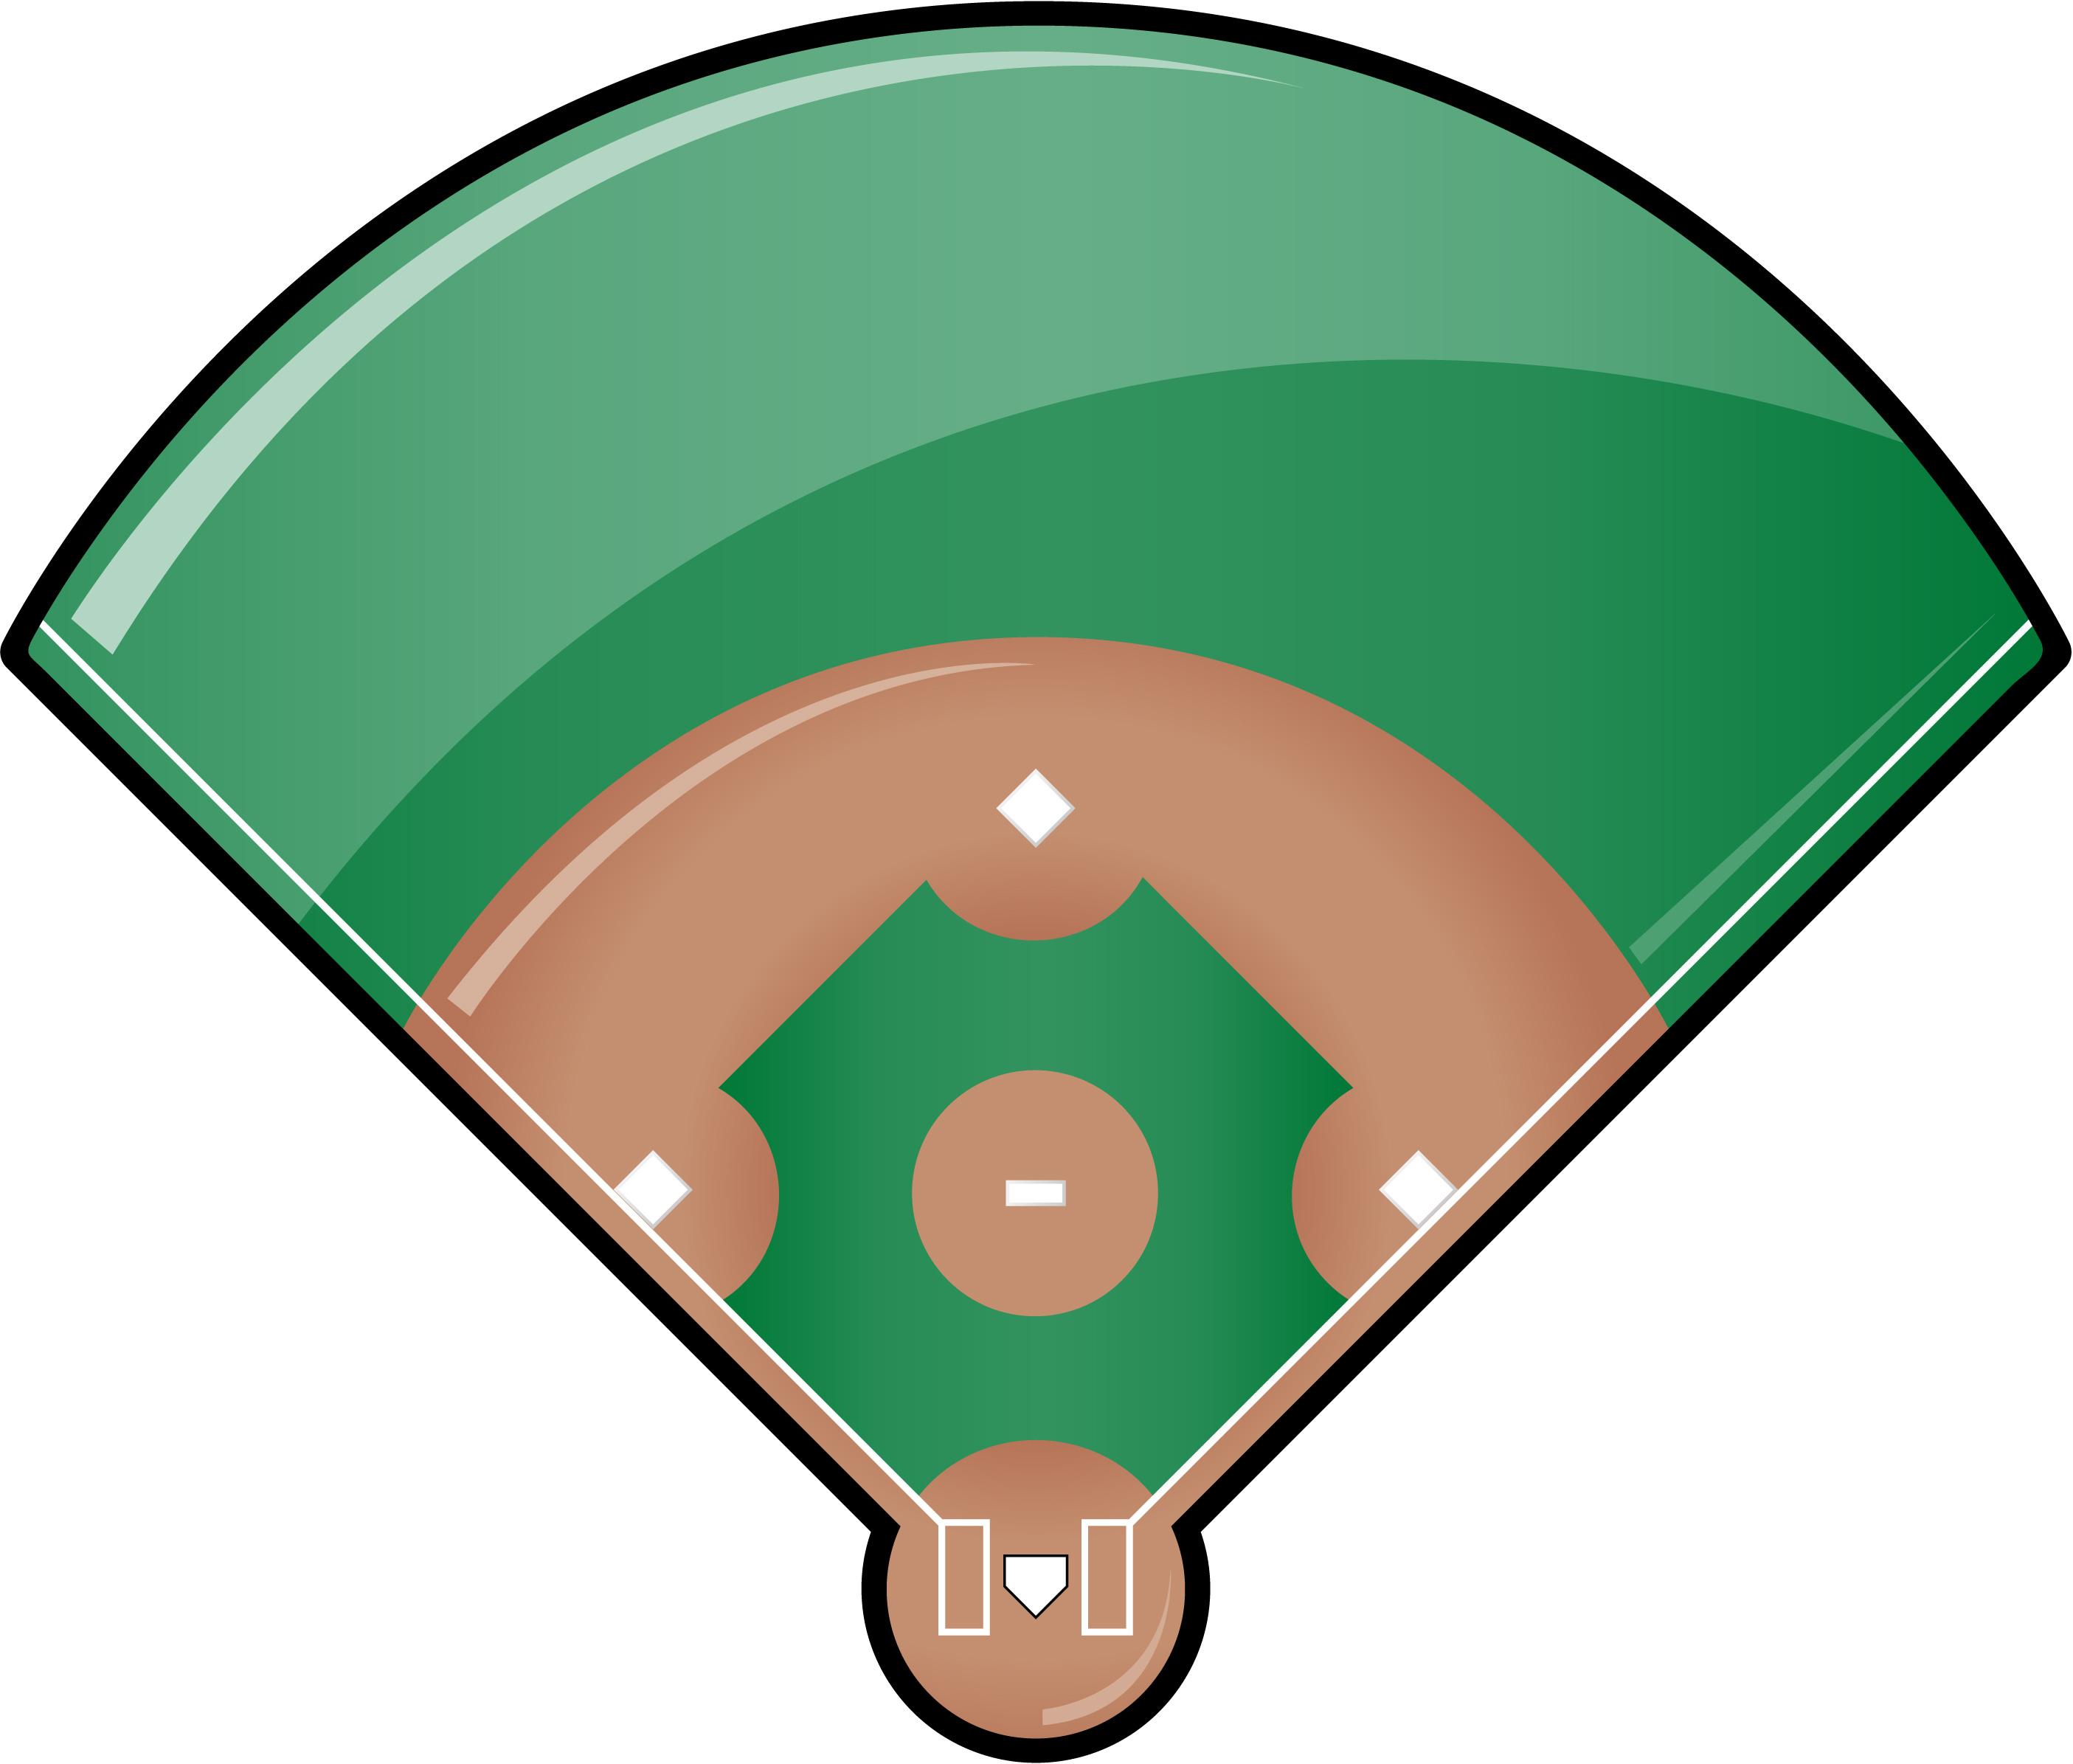 baseball field clipart